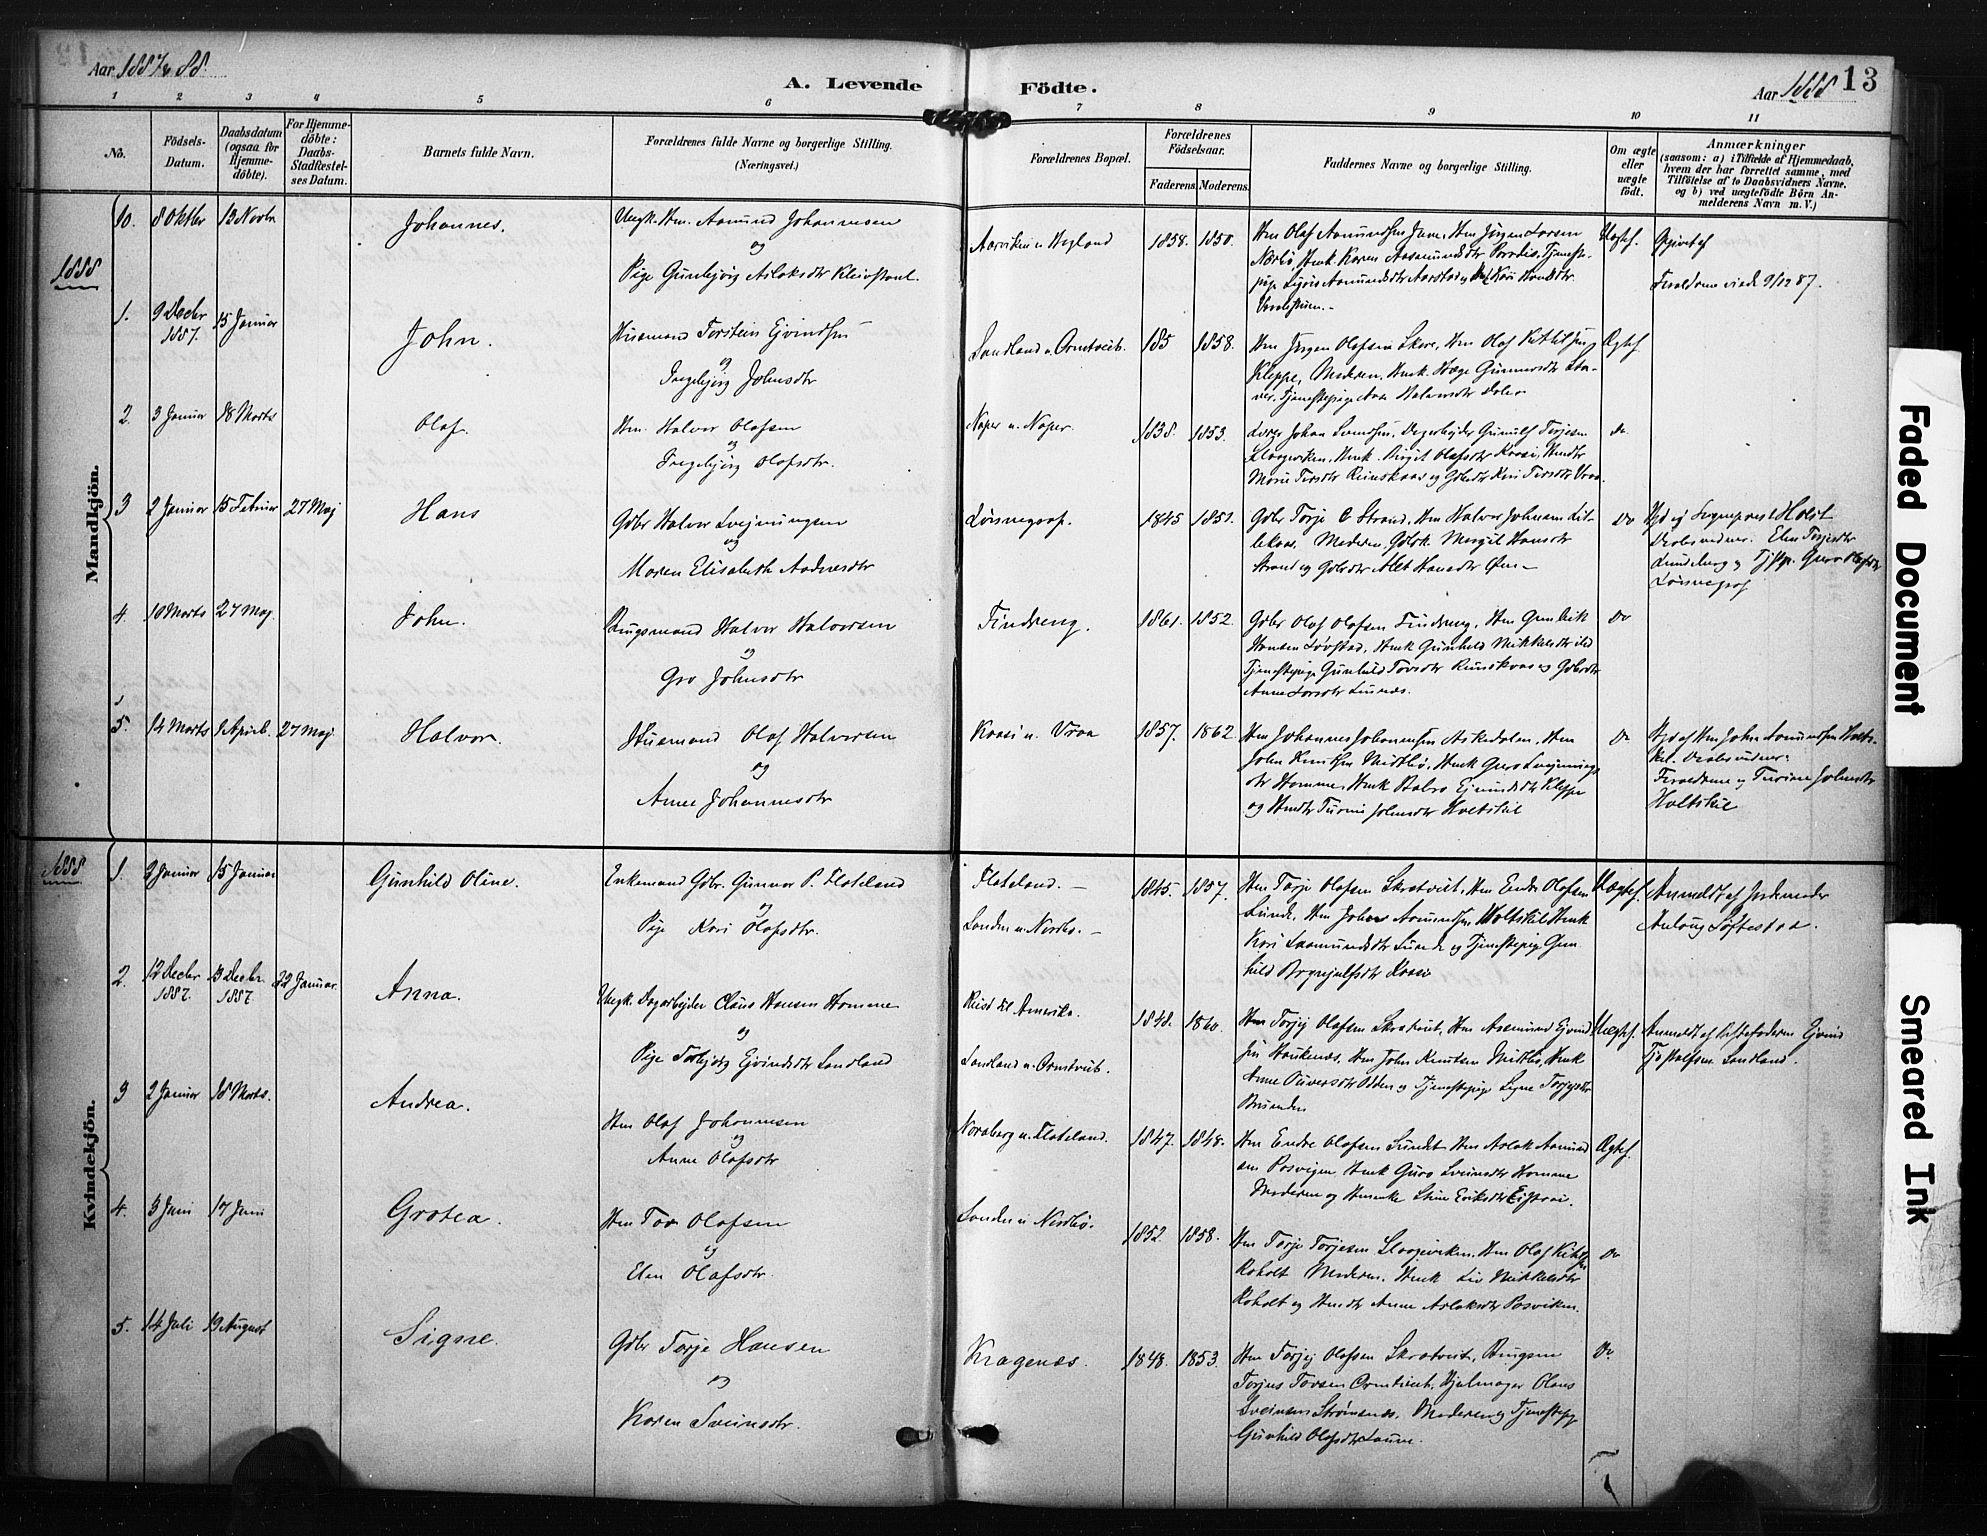 SAKO, Kviteseid kirkebøker, F/Fc/L0002: Ministerialbok nr. III 2, 1882-1908, s. 13